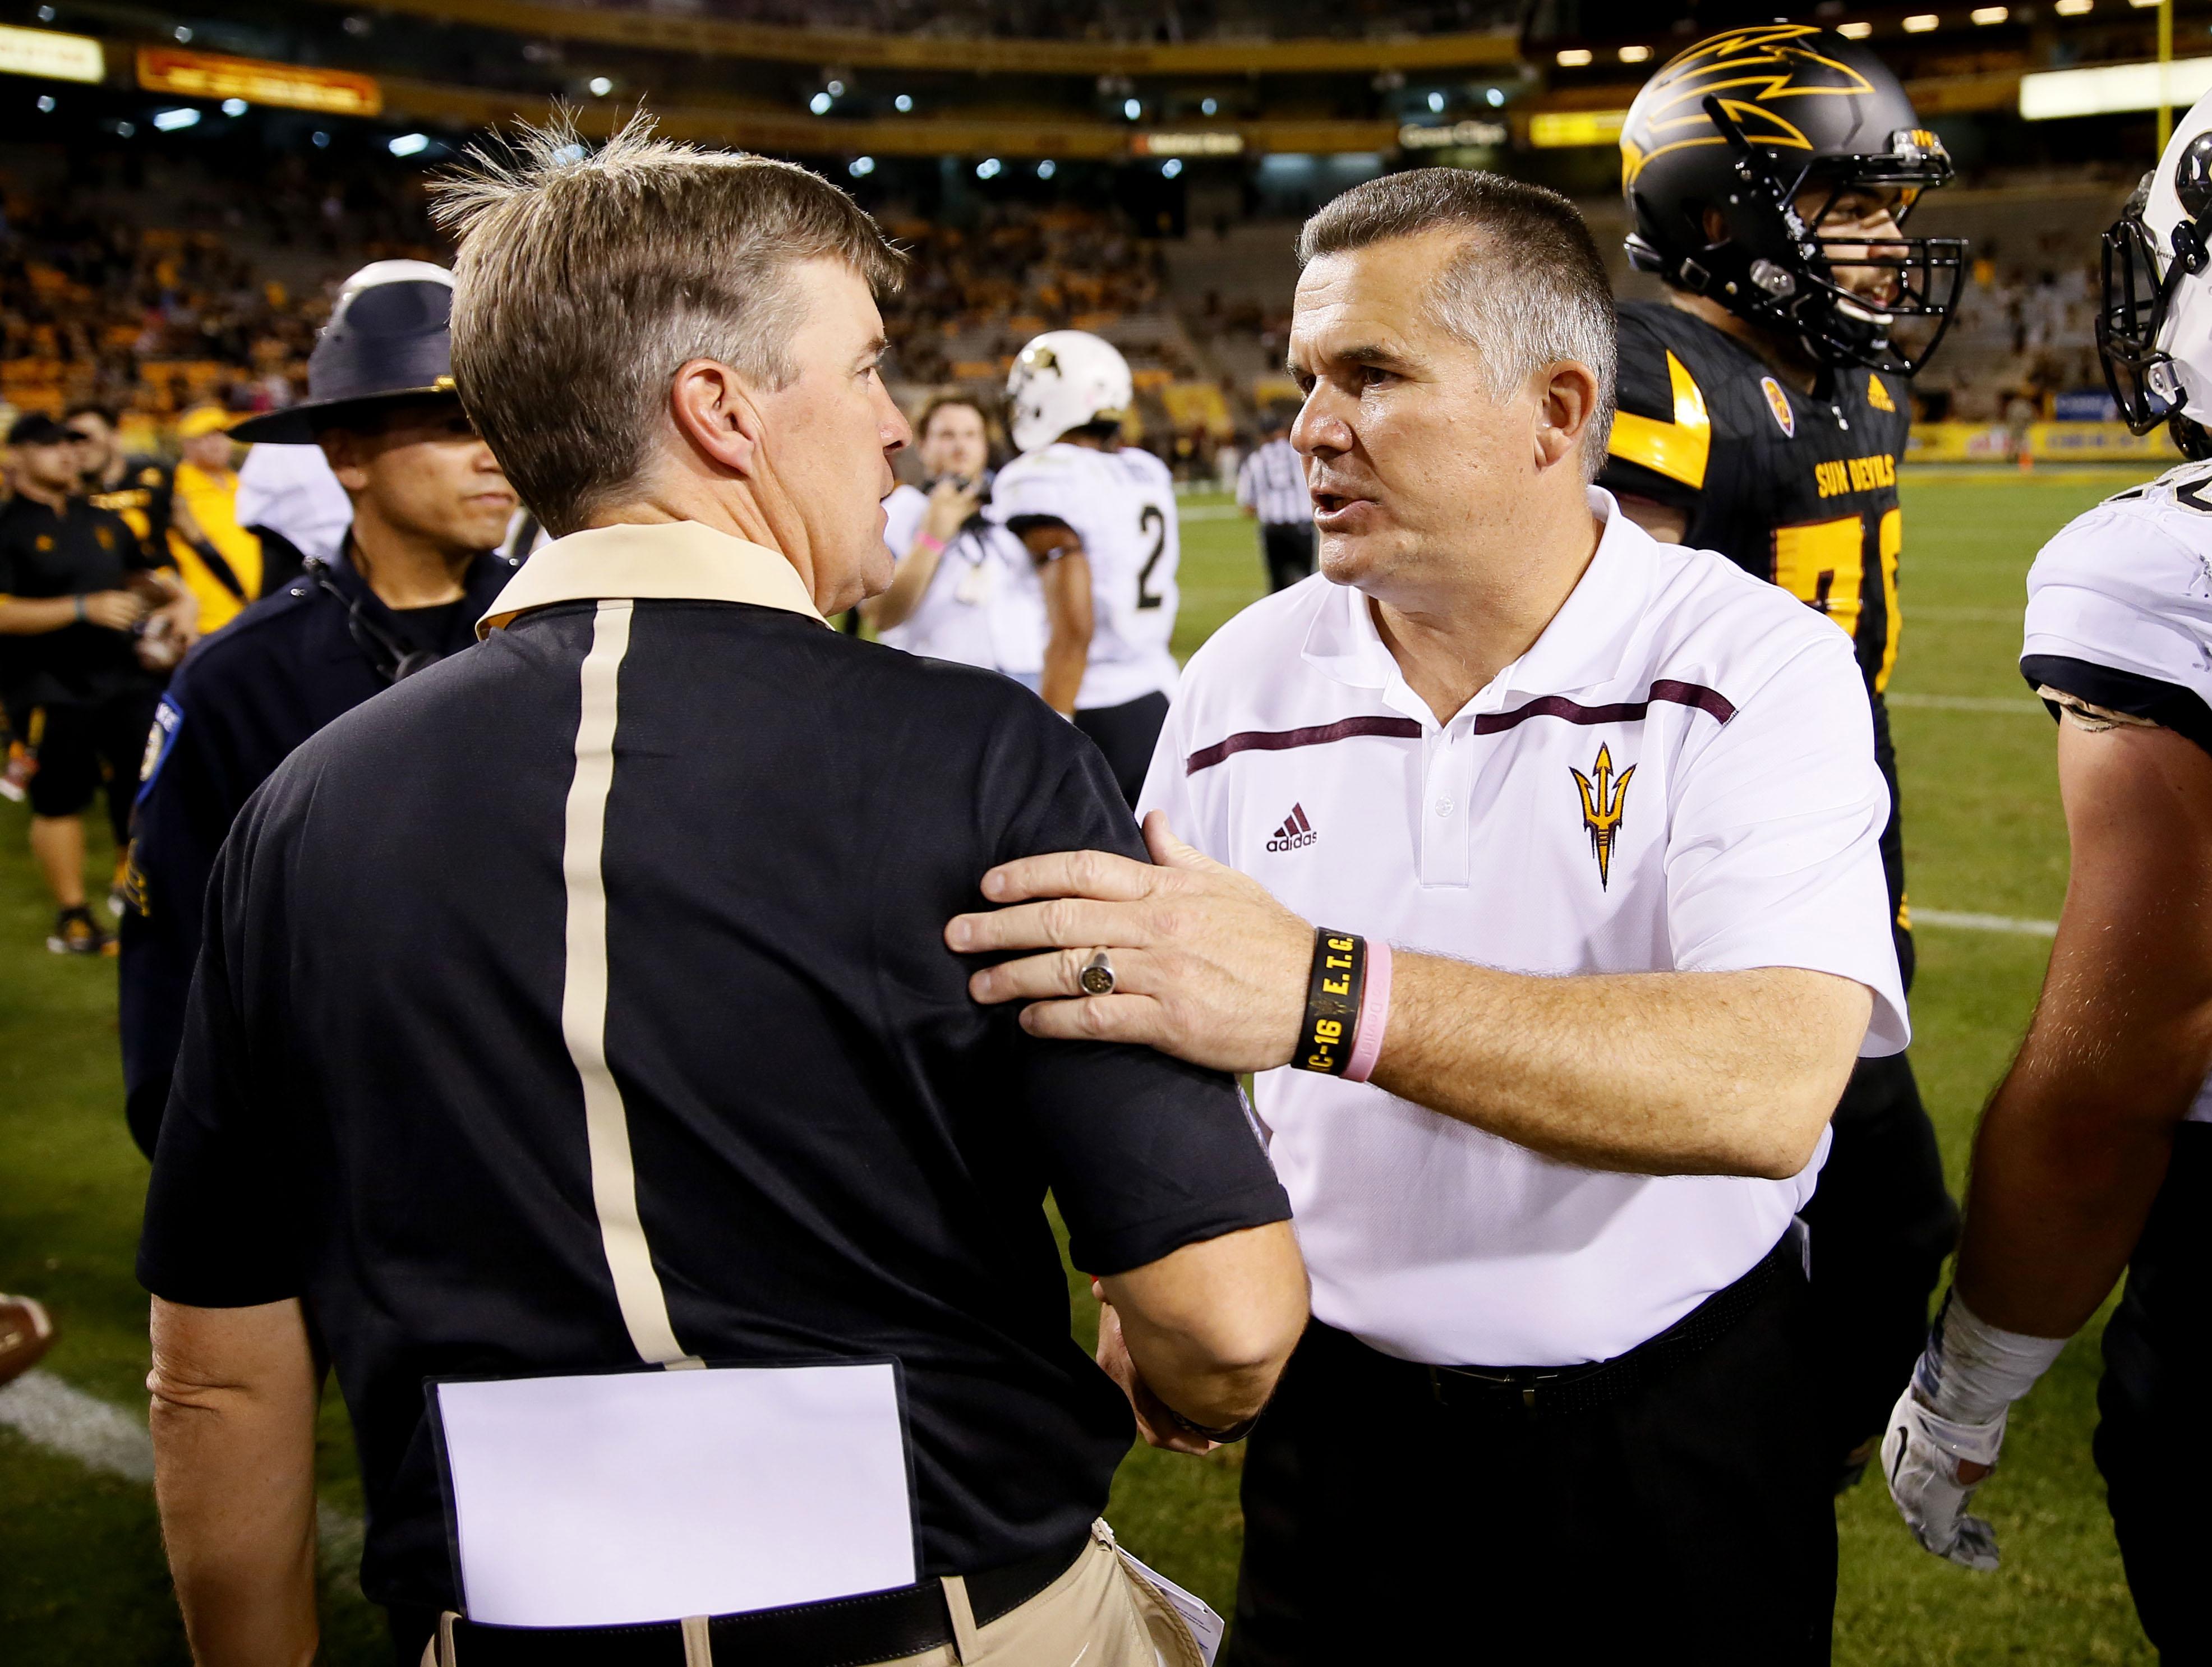 Arizona State head coach Todd Graham, right, greets Colorado head coach Mike MacIntyre after an NCAA college football game, Saturday, Oct. 10, 2015, in Tempe, Ariz. Arizona State won 48-23. (AP Photo/Matt York)